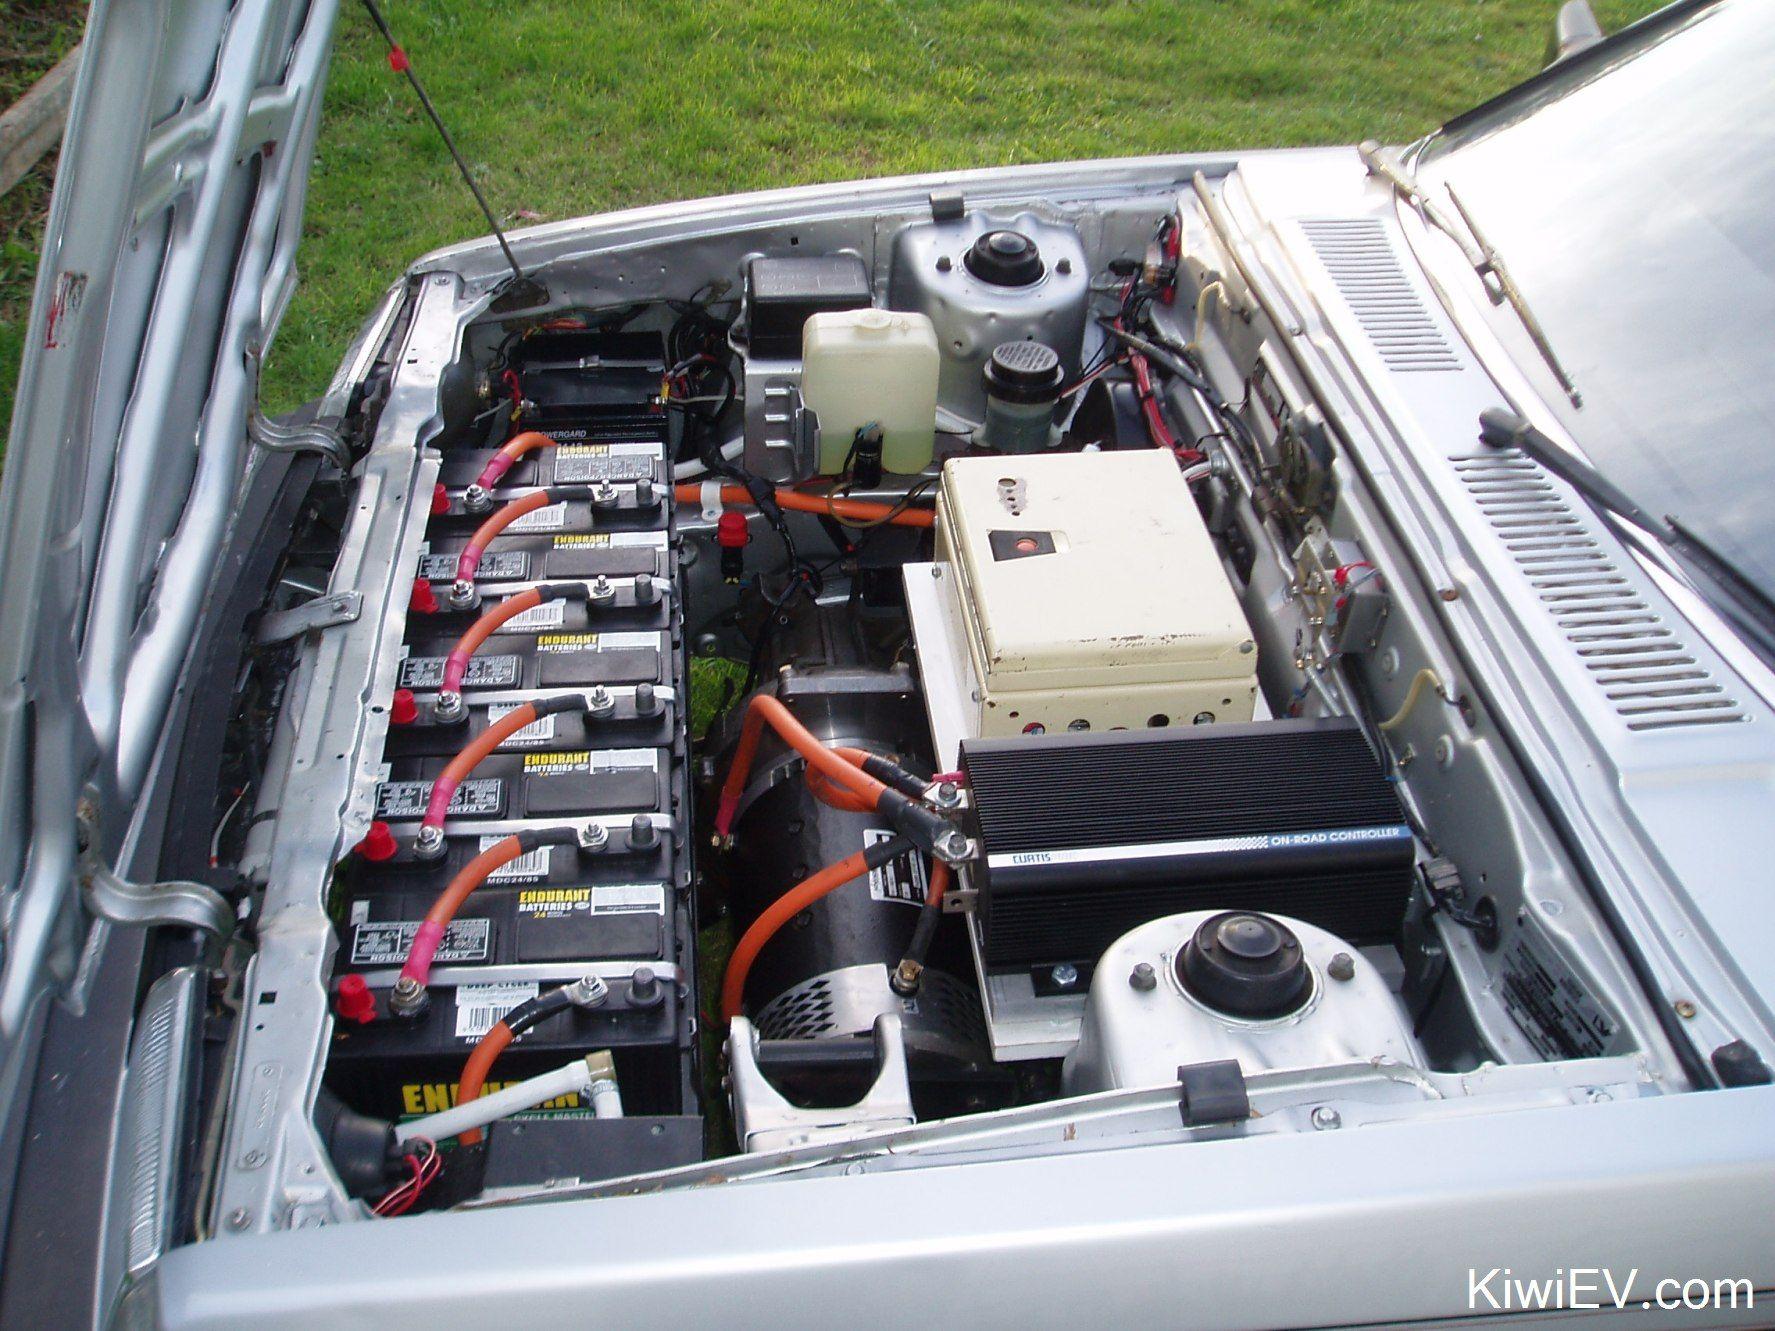 Stupendous Evsecrets Electric Car Conversion Guide Gavinshoebridge Home Remodeling Inspirations Gresiscottssportslandcom